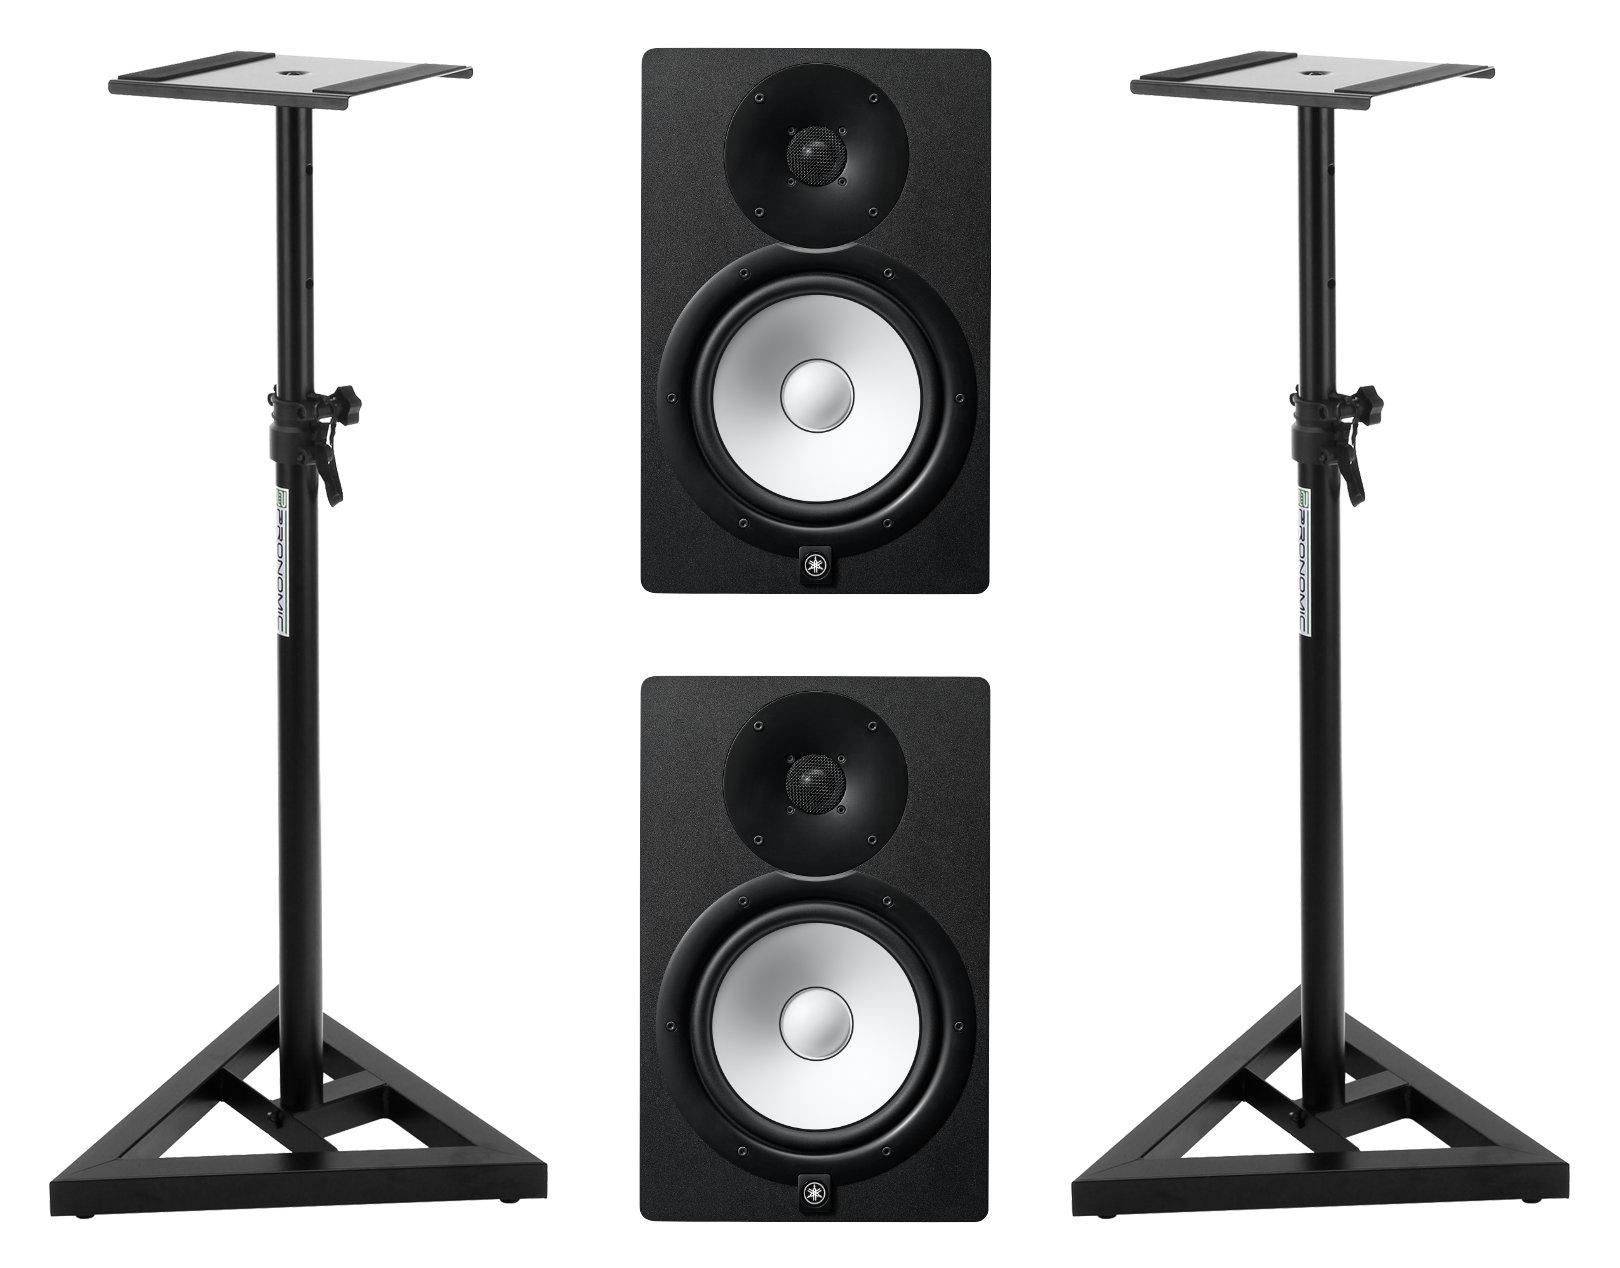 Studiomonitore - Yamaha HS8 MP Stativ Set - Onlineshop Musikhaus Kirstein